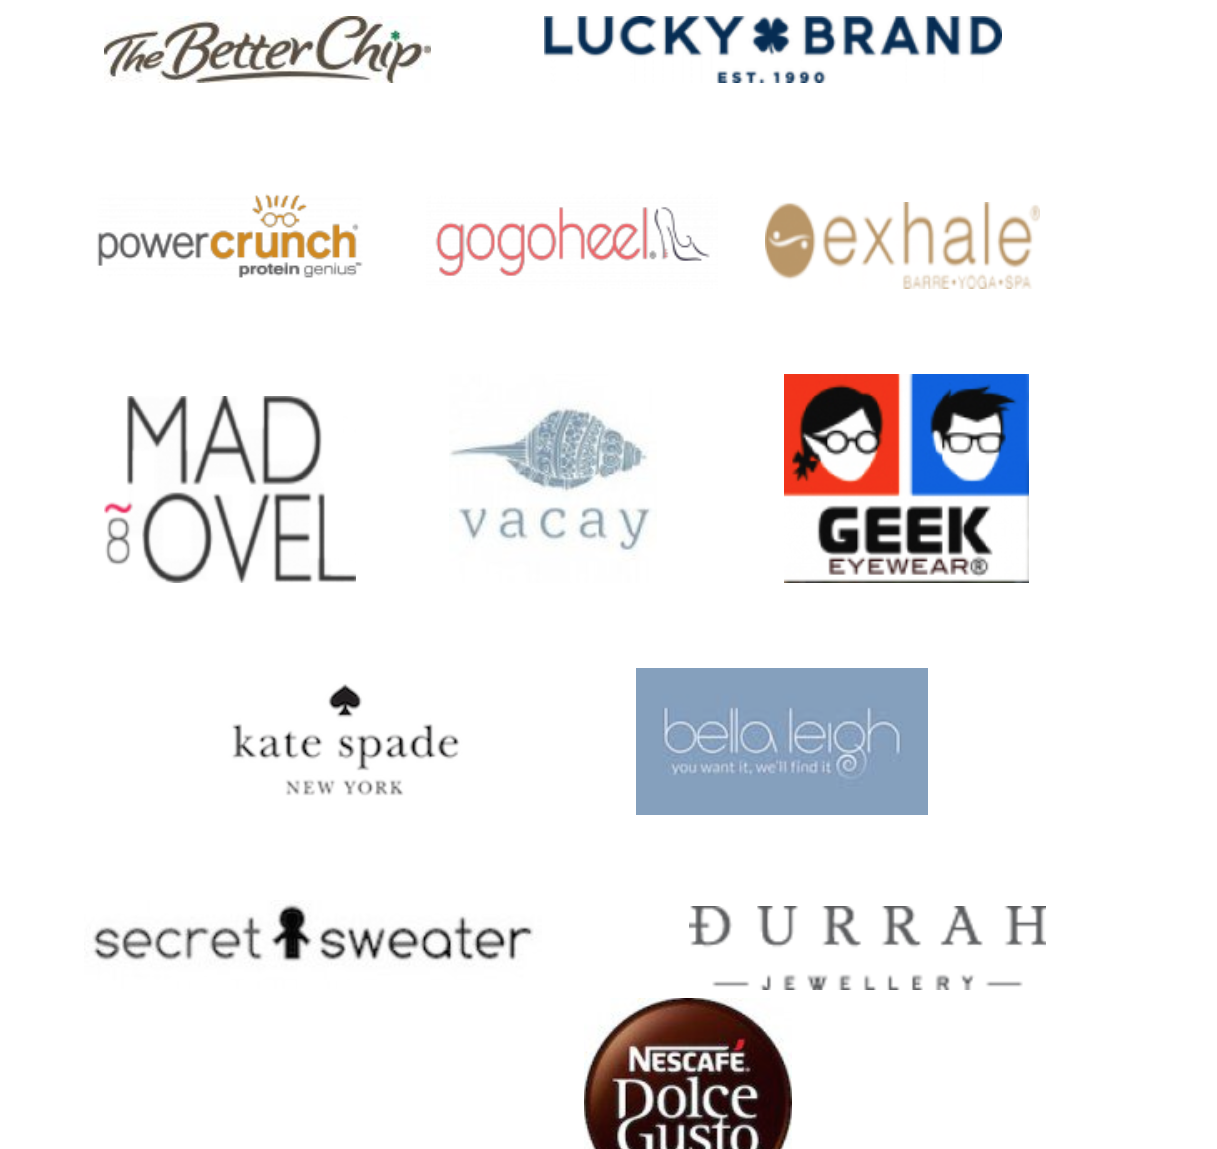 geek-eyewear-harvest-boutique-2015-junior-league.png